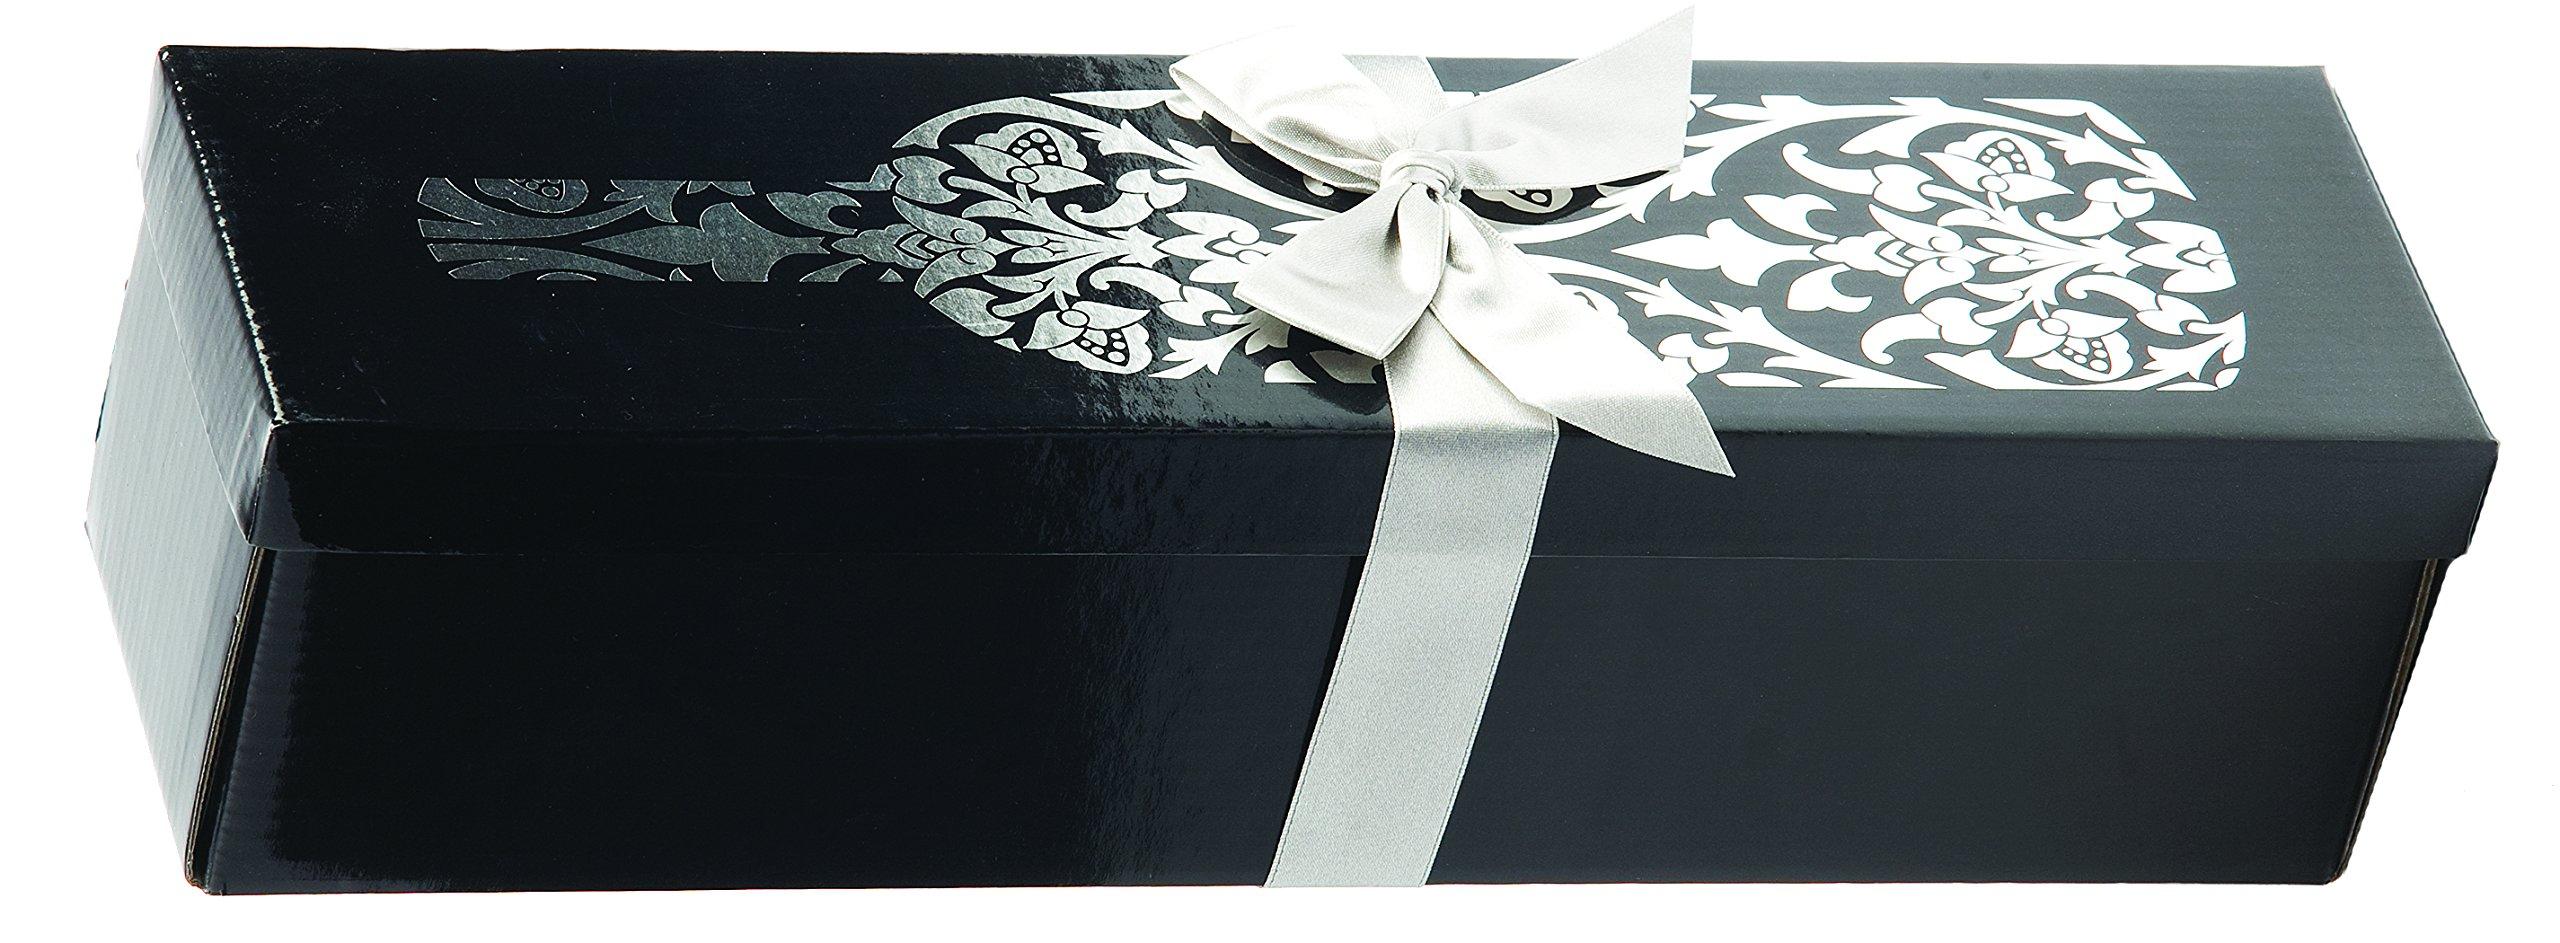 Cakewalk A Touch of Silver Single Bottle Wine Box, Black